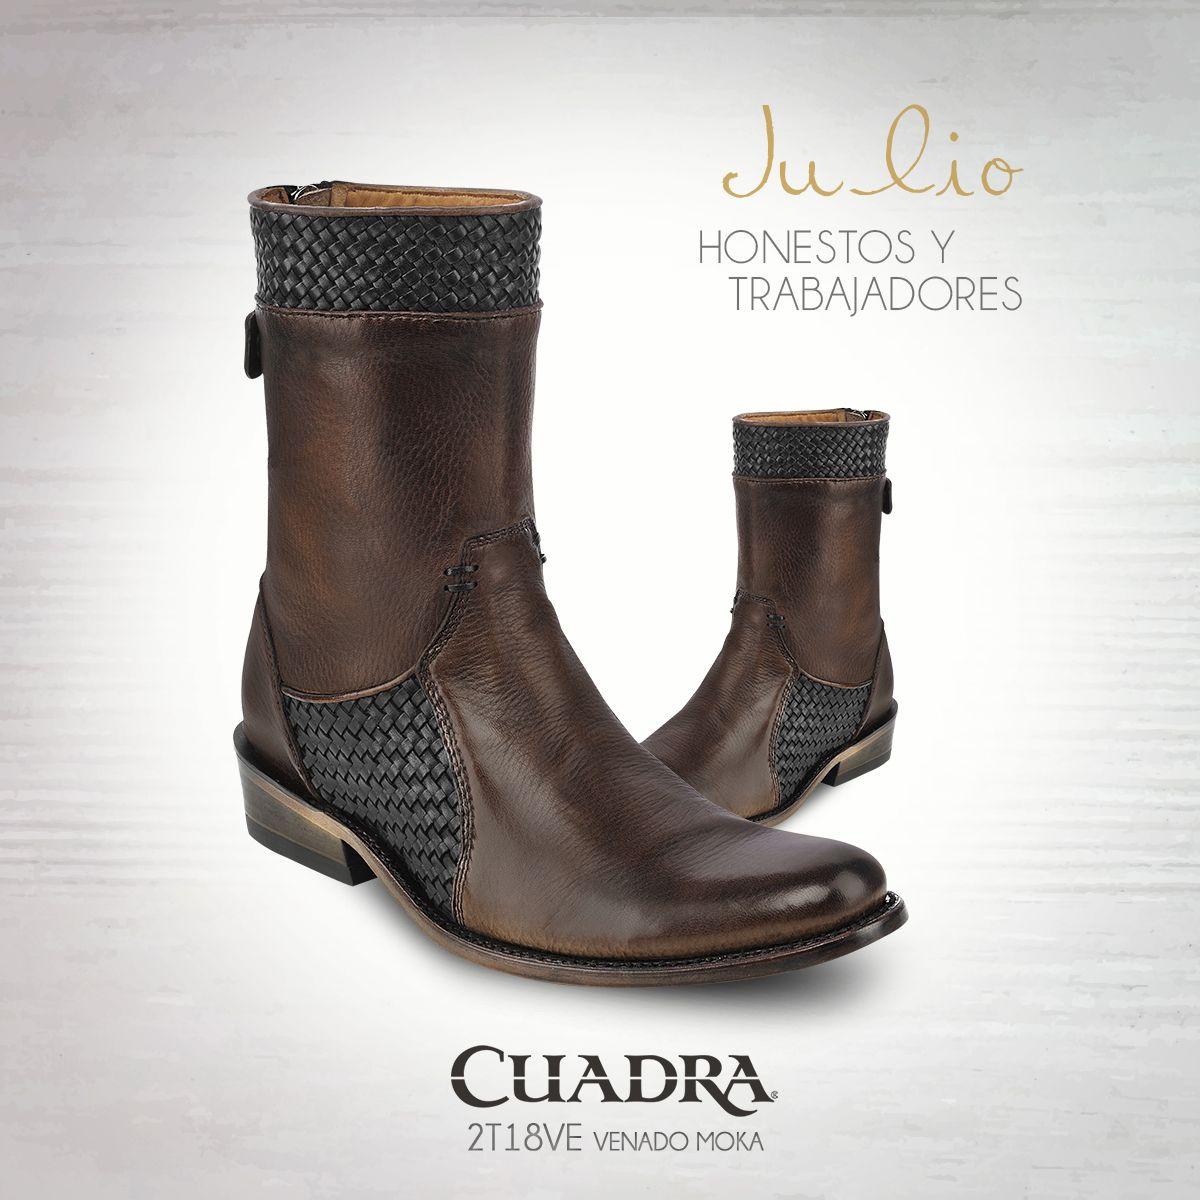 1b92b6e930f Bienvenido  Julio con mis  botas  CUADRA  Boots  FashionStyle